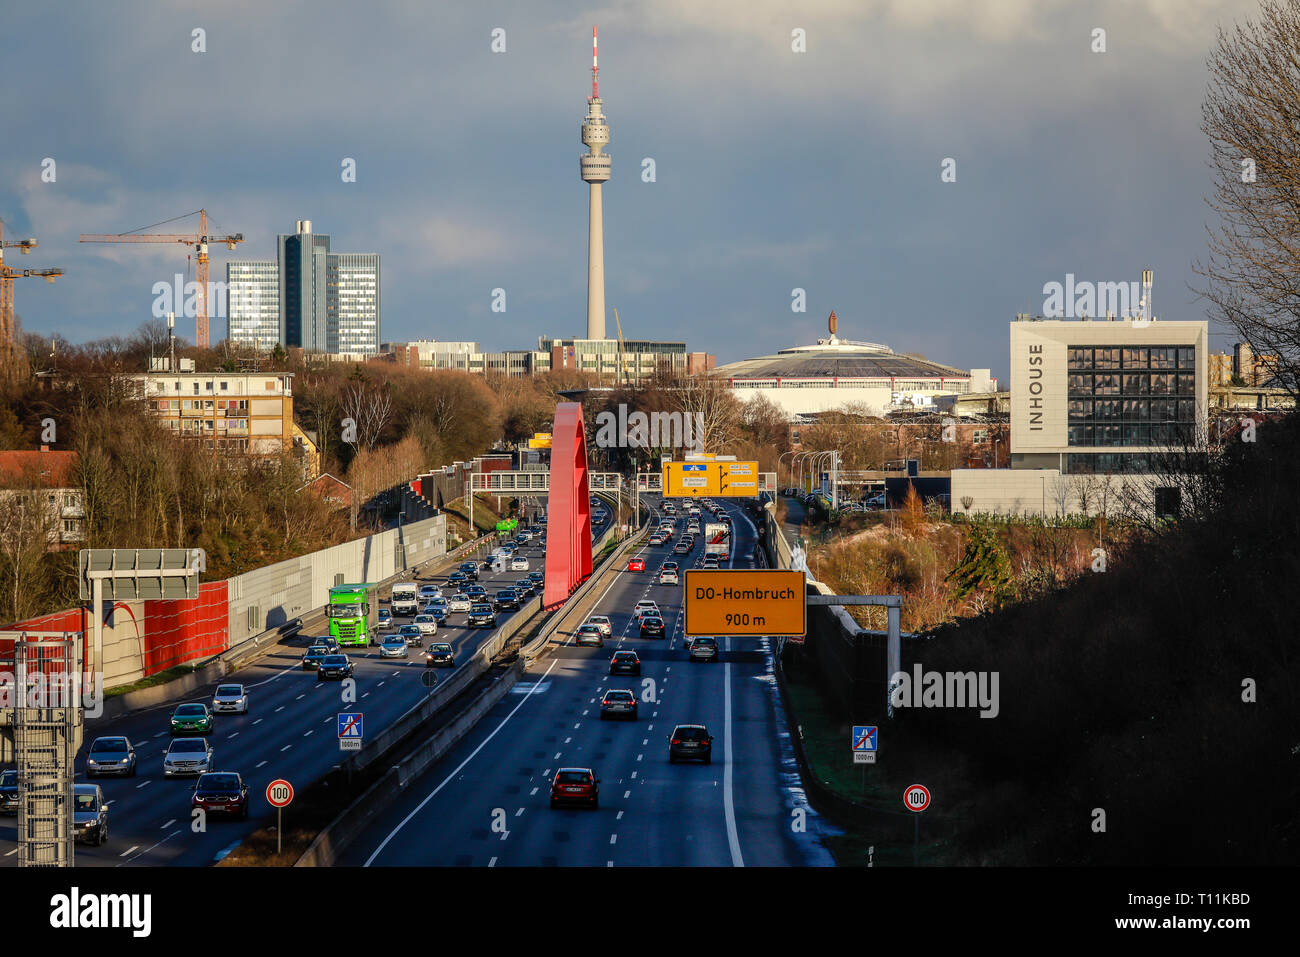 Dortmund, Ruhr area, North Rhine-Westphalia, Germany - City view with motorway A40, Westfalenhalle and radio tower. Dortmund, Ruhrgebiet, Nordrhein-We - Stock Image